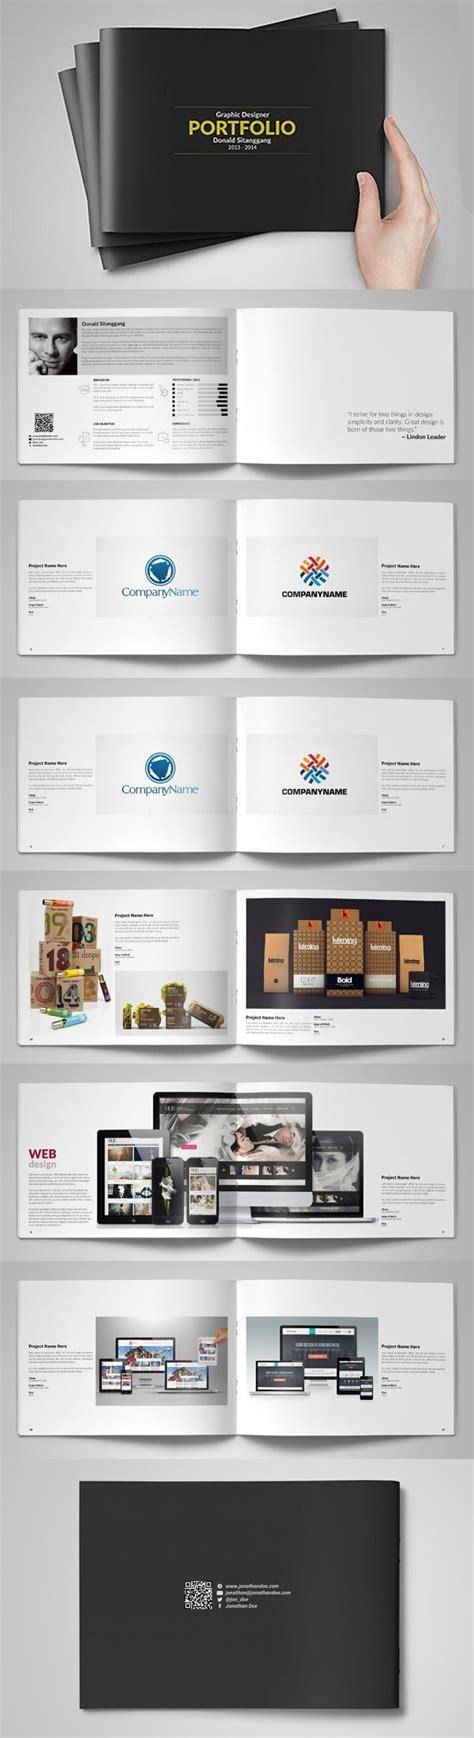 graphic design portfolio layout print print portfolio design layout www imgkid com the image